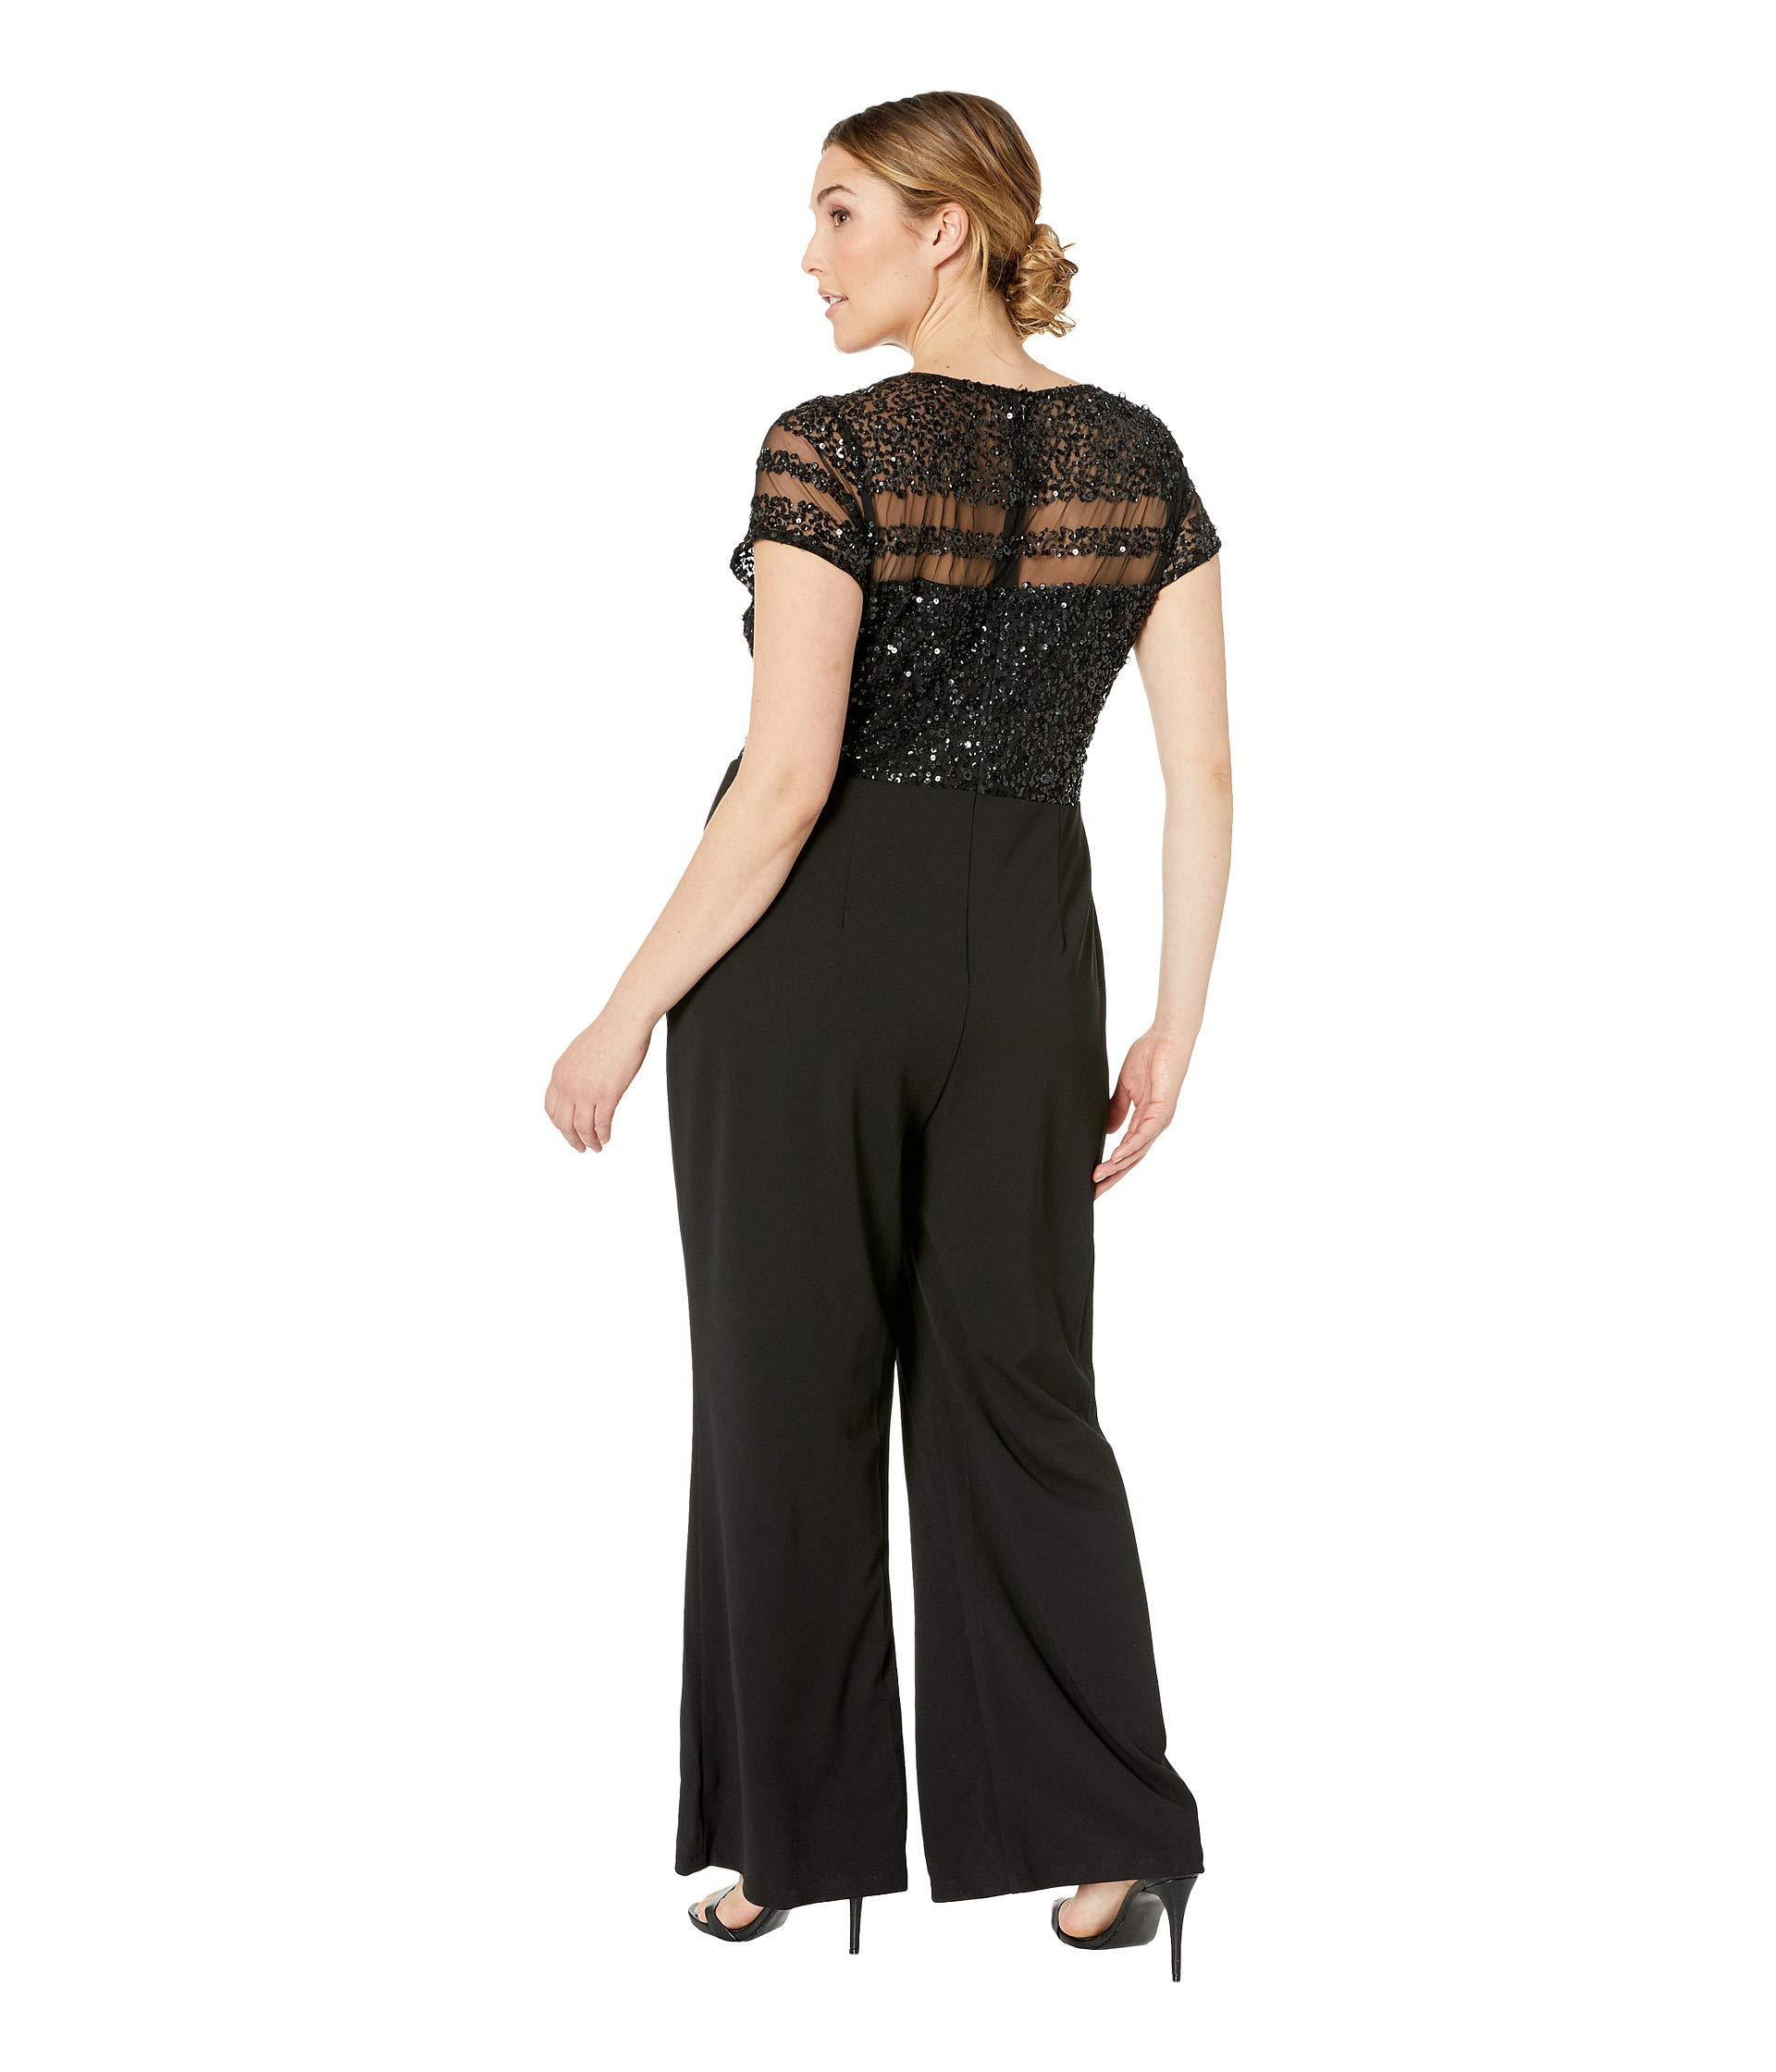 f84d9d2044ed Adrianna Papell - Plus Size Crepe Jumpsuit (black) Women s Jumpsuit    Rompers One Piece. View fullscreen